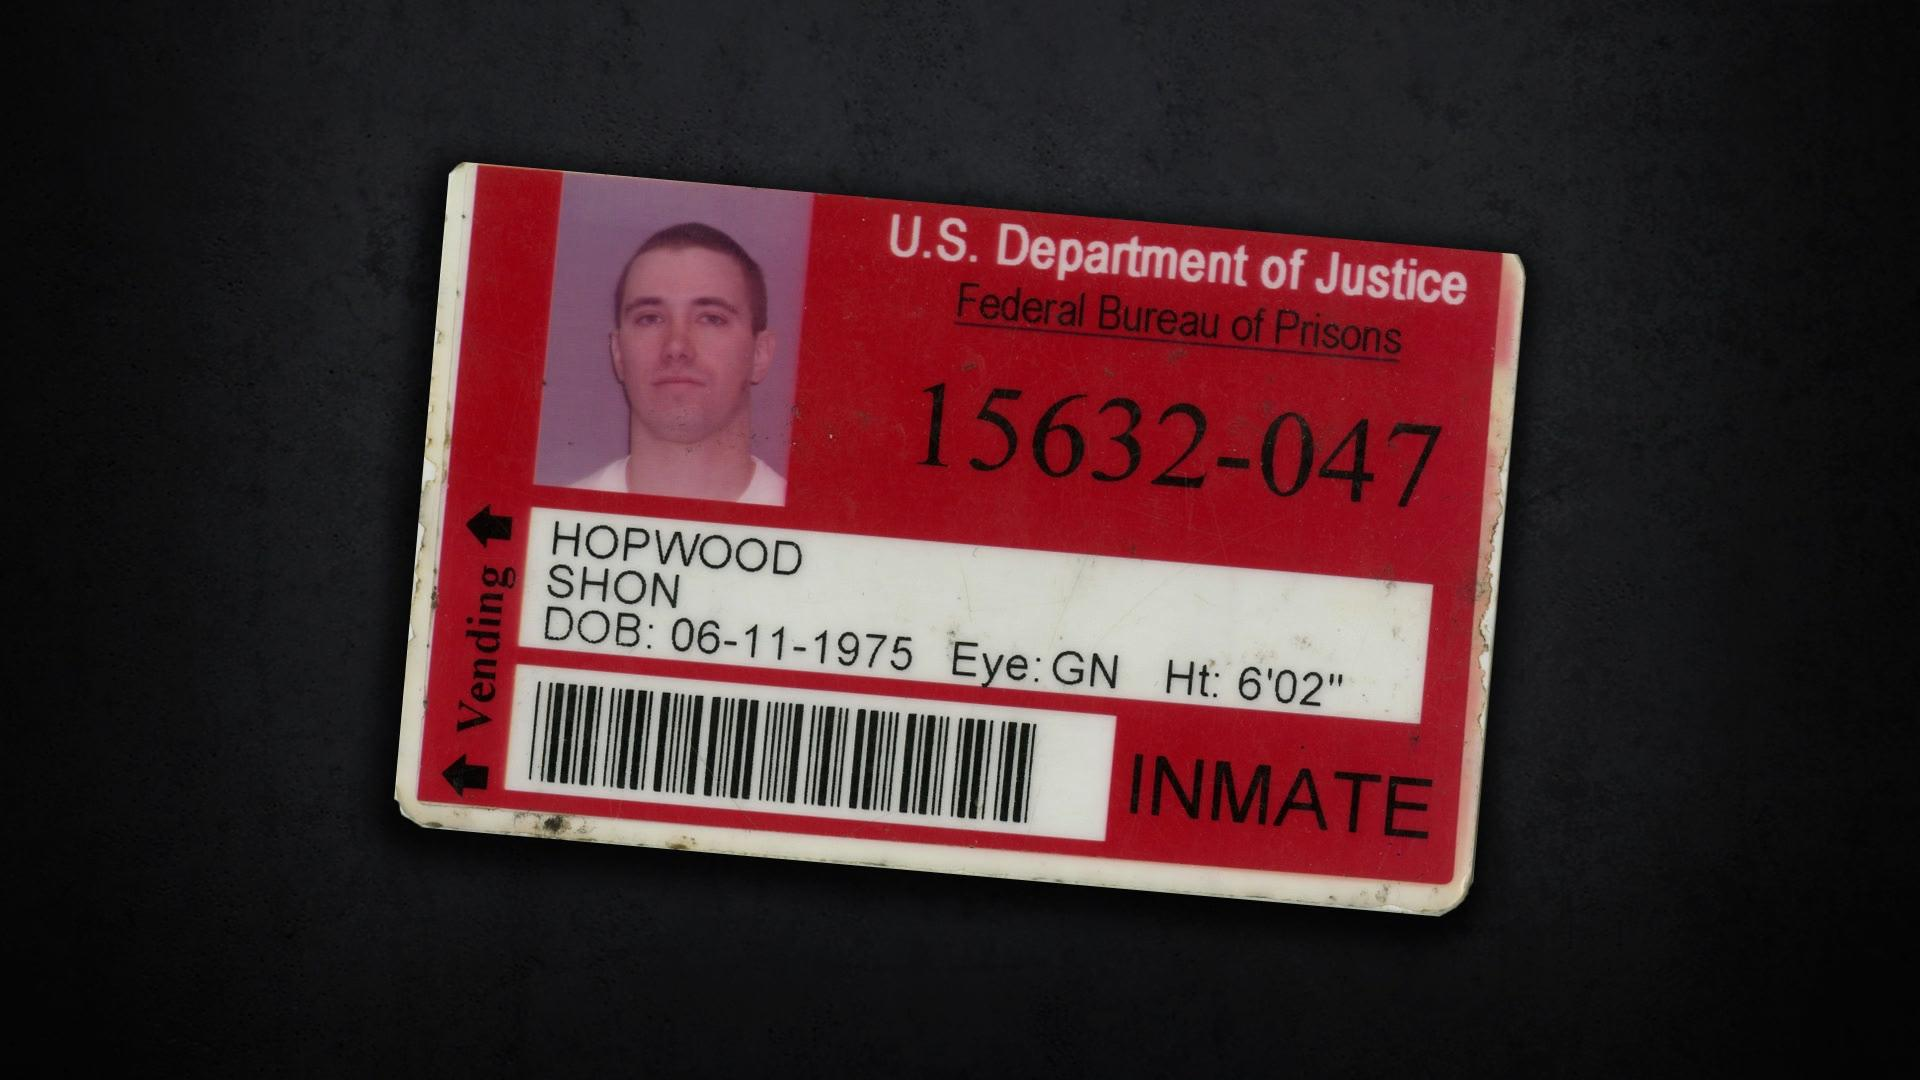 Shon Hopwood: Meet a convicted felon who became a Georgetown